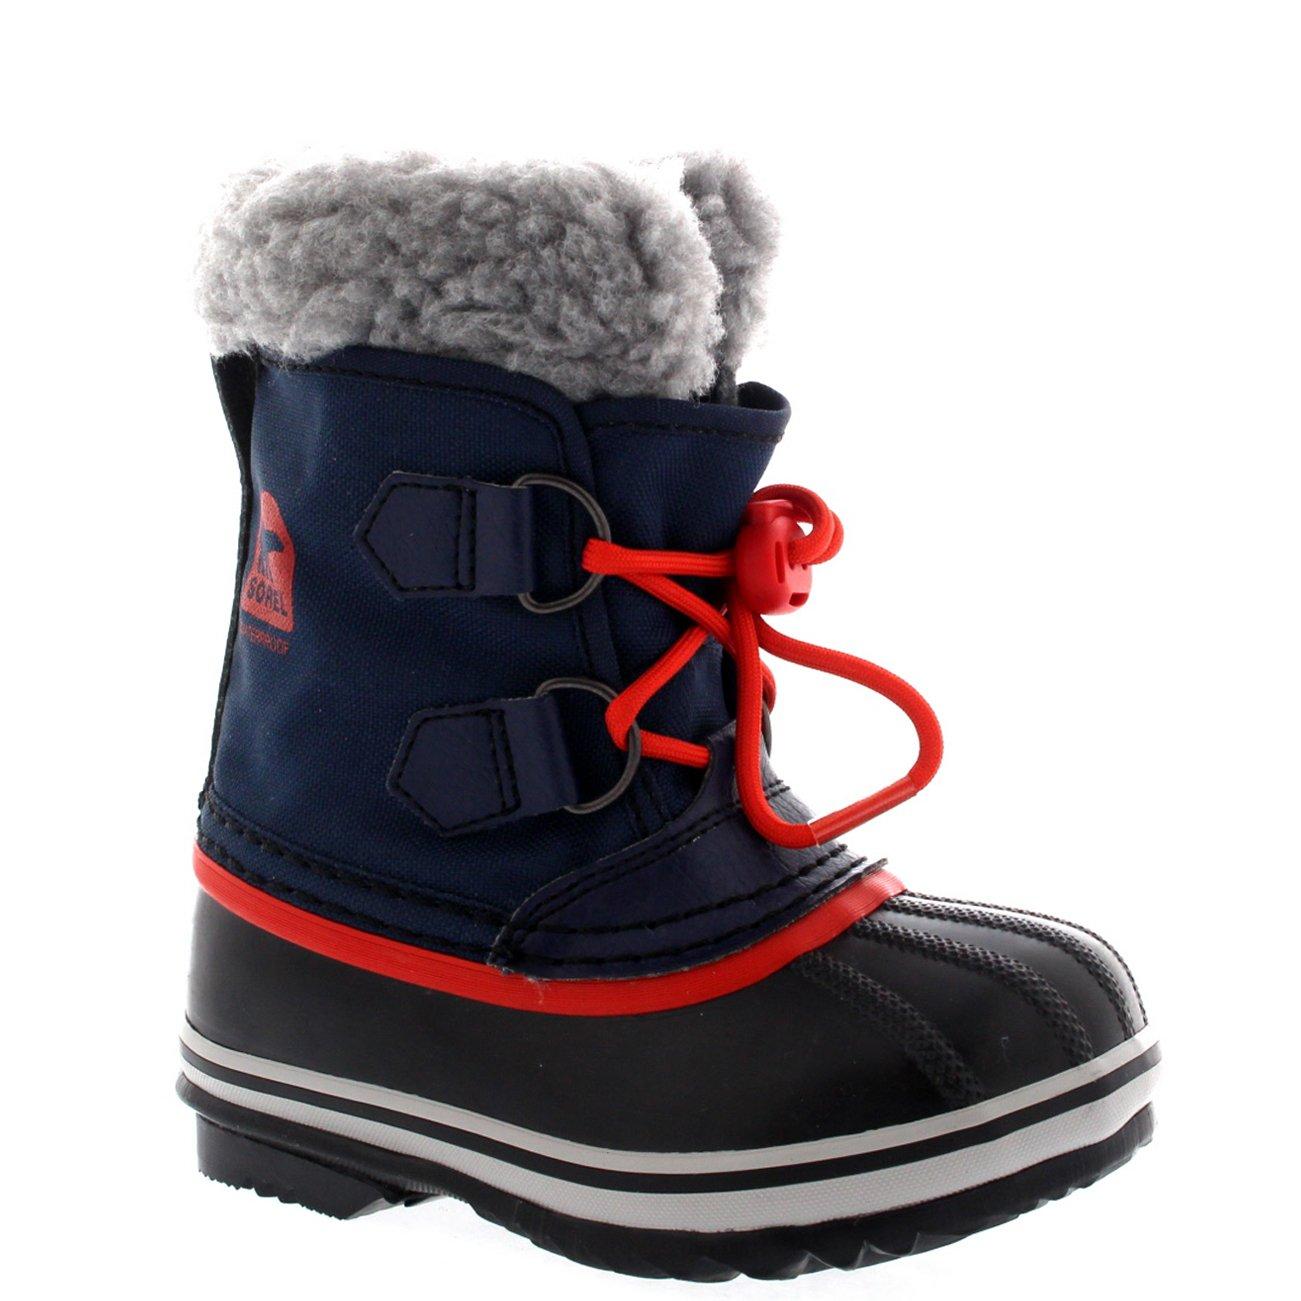 SOREL Unisex Kids Youth Yoot Pac Nylon Waterproof Snow Warm Rain Winter Boots - Collegiate Navy - 1/32